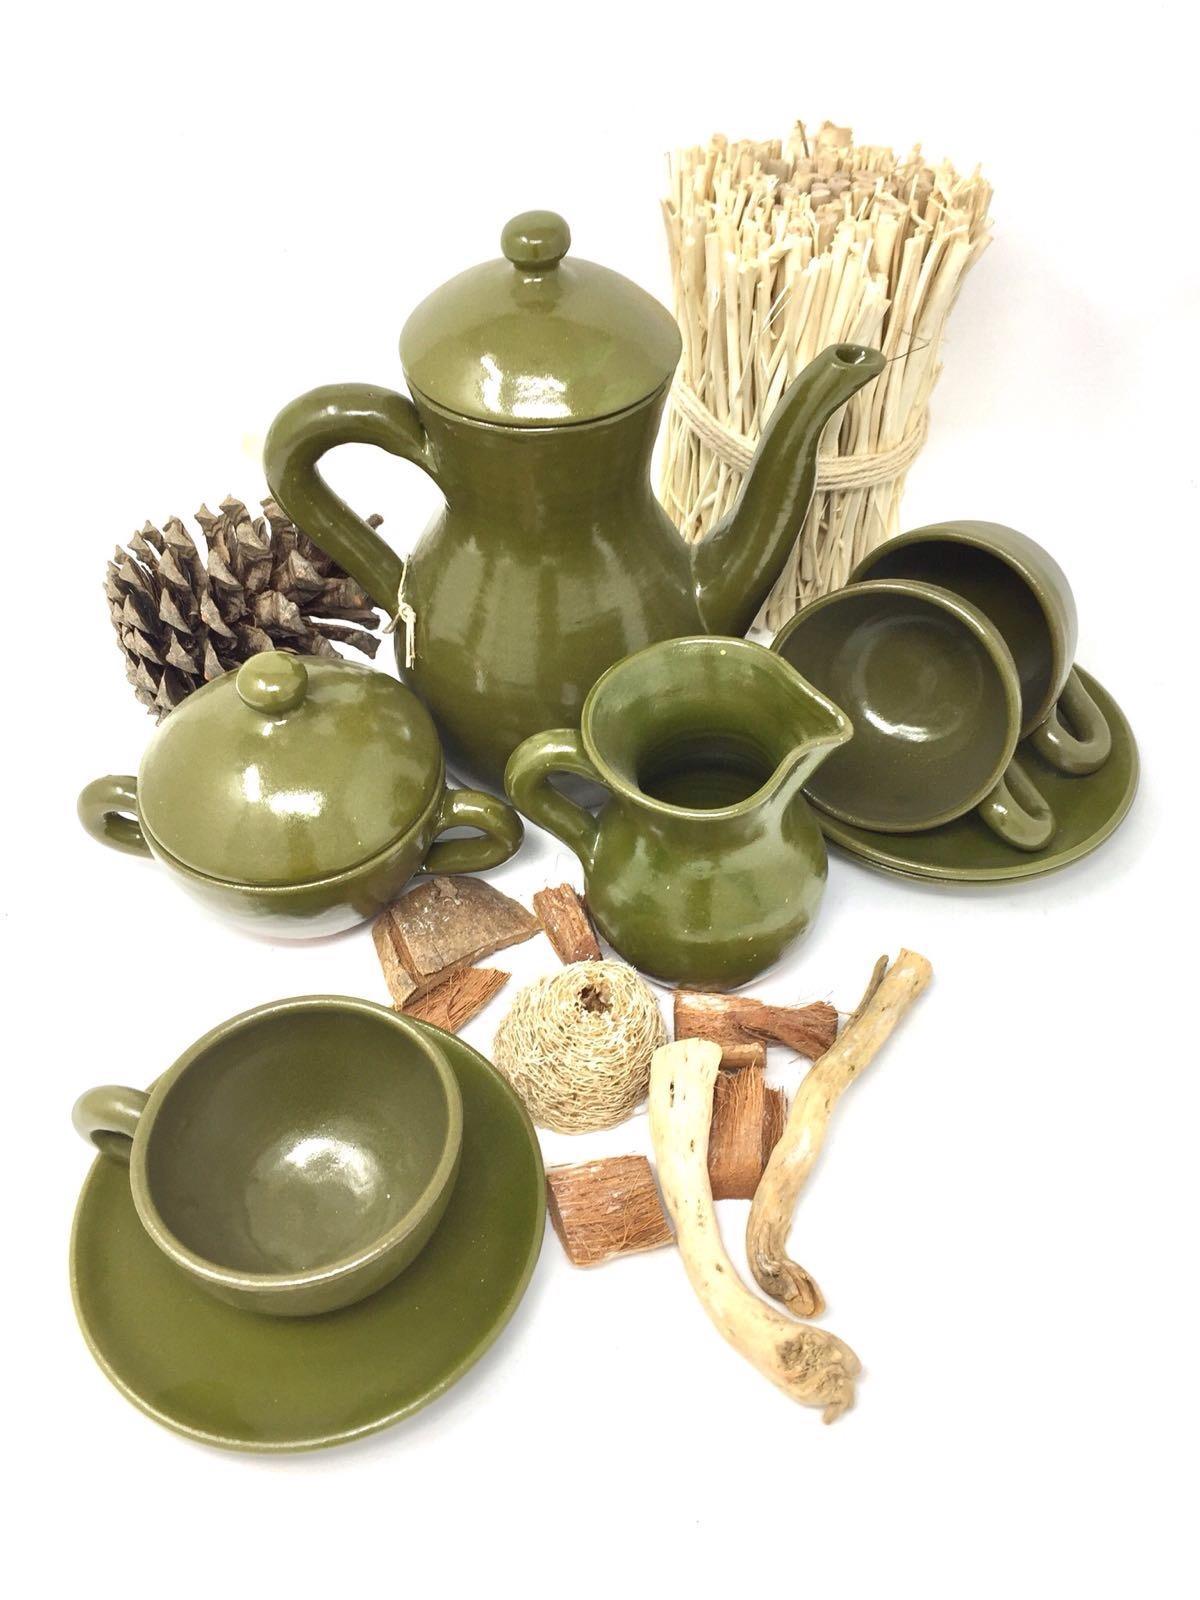 Juego de café verde militar